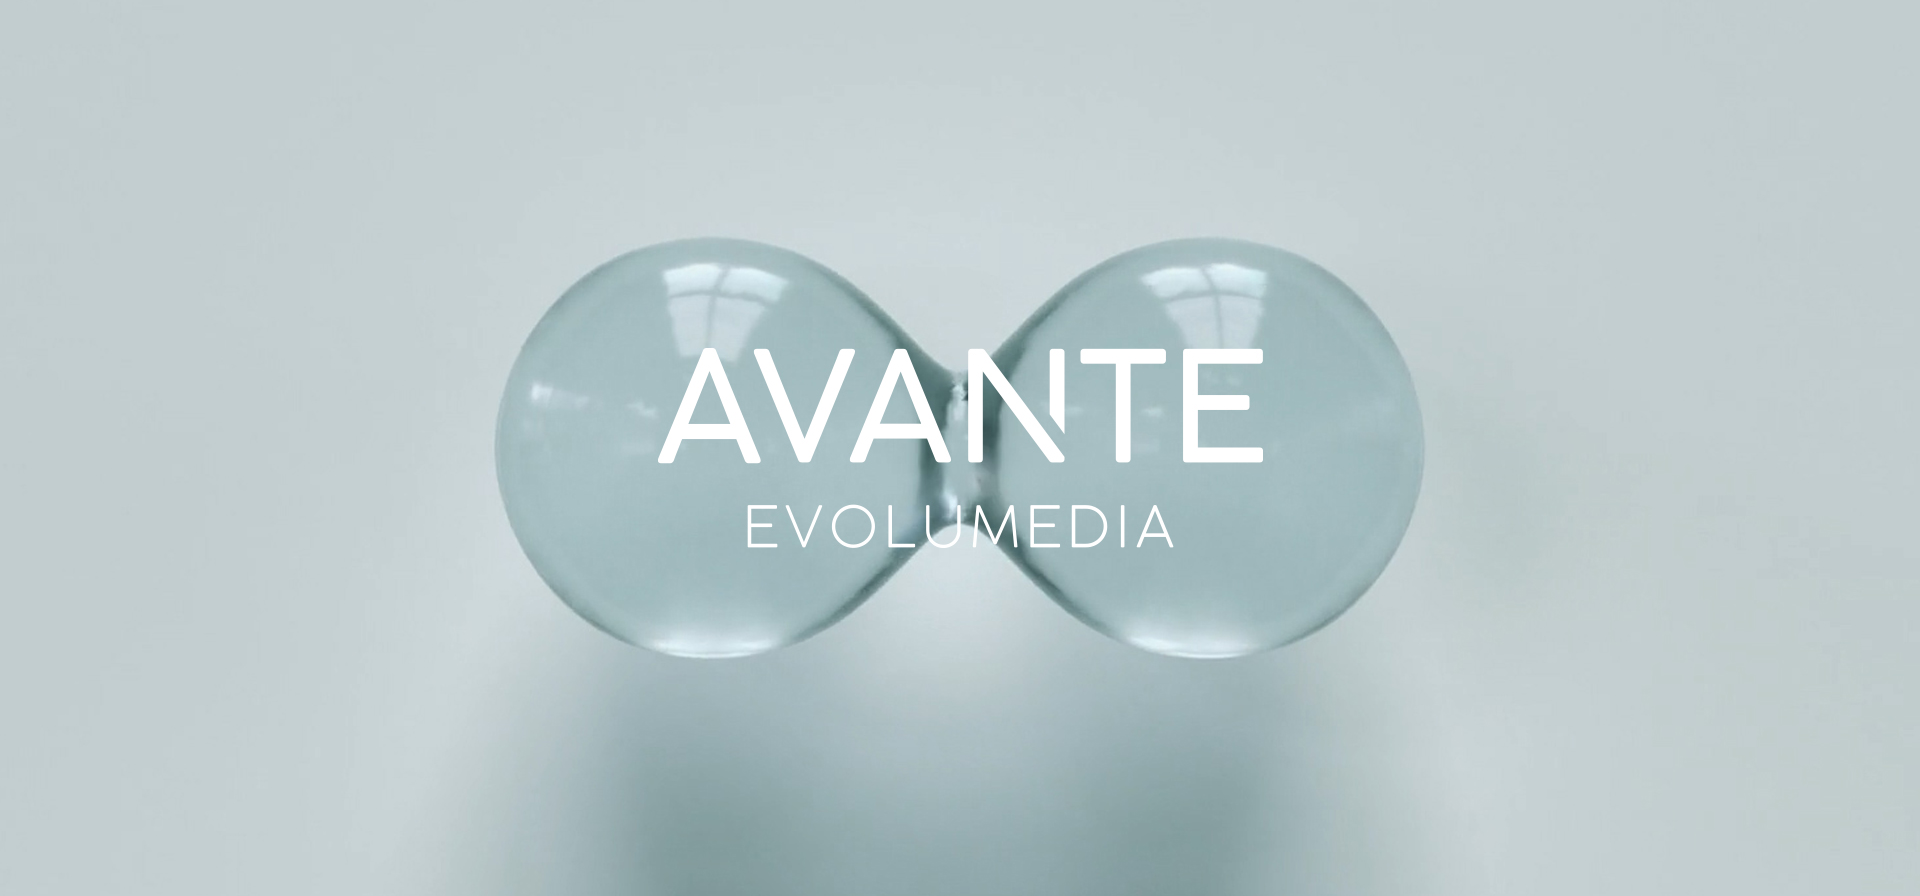 avante-evolumedia-extradigital